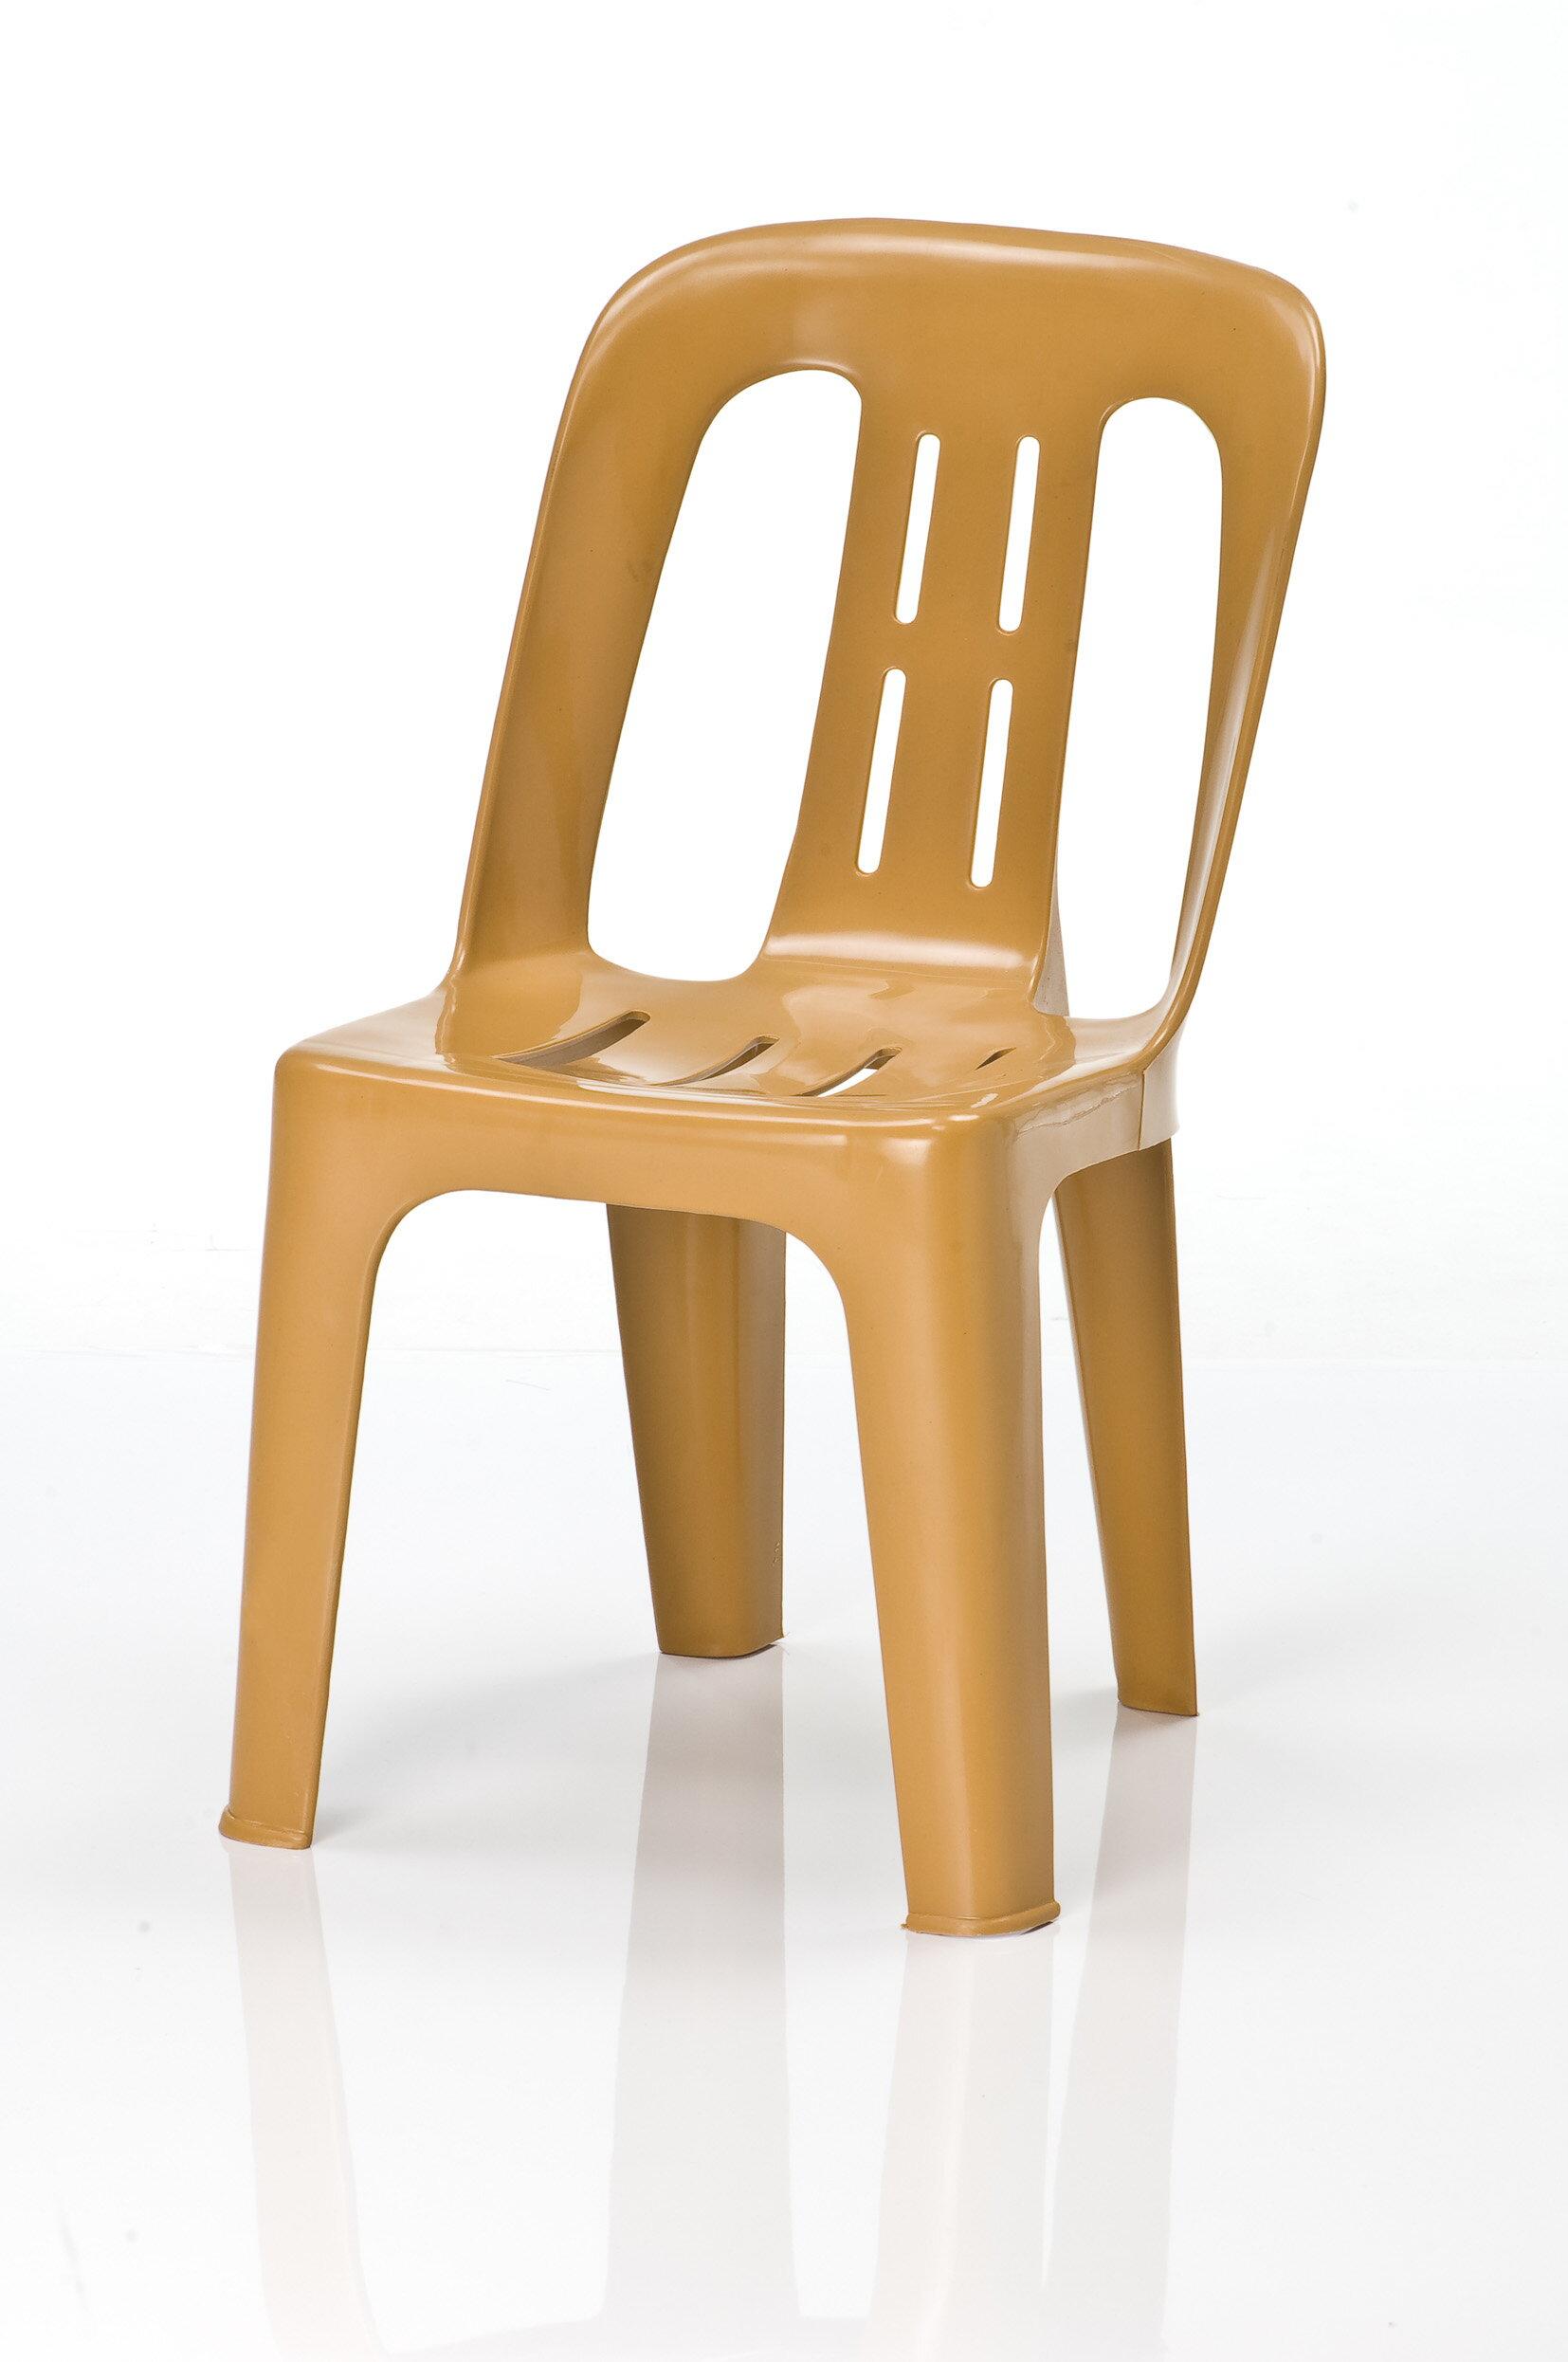 【MK KID CHAIR 4入一組】精巧實用塑膠座椅/附椅背板凳/舒適椅背/符合人體工學椅座/僅此一檔賣完為止★★